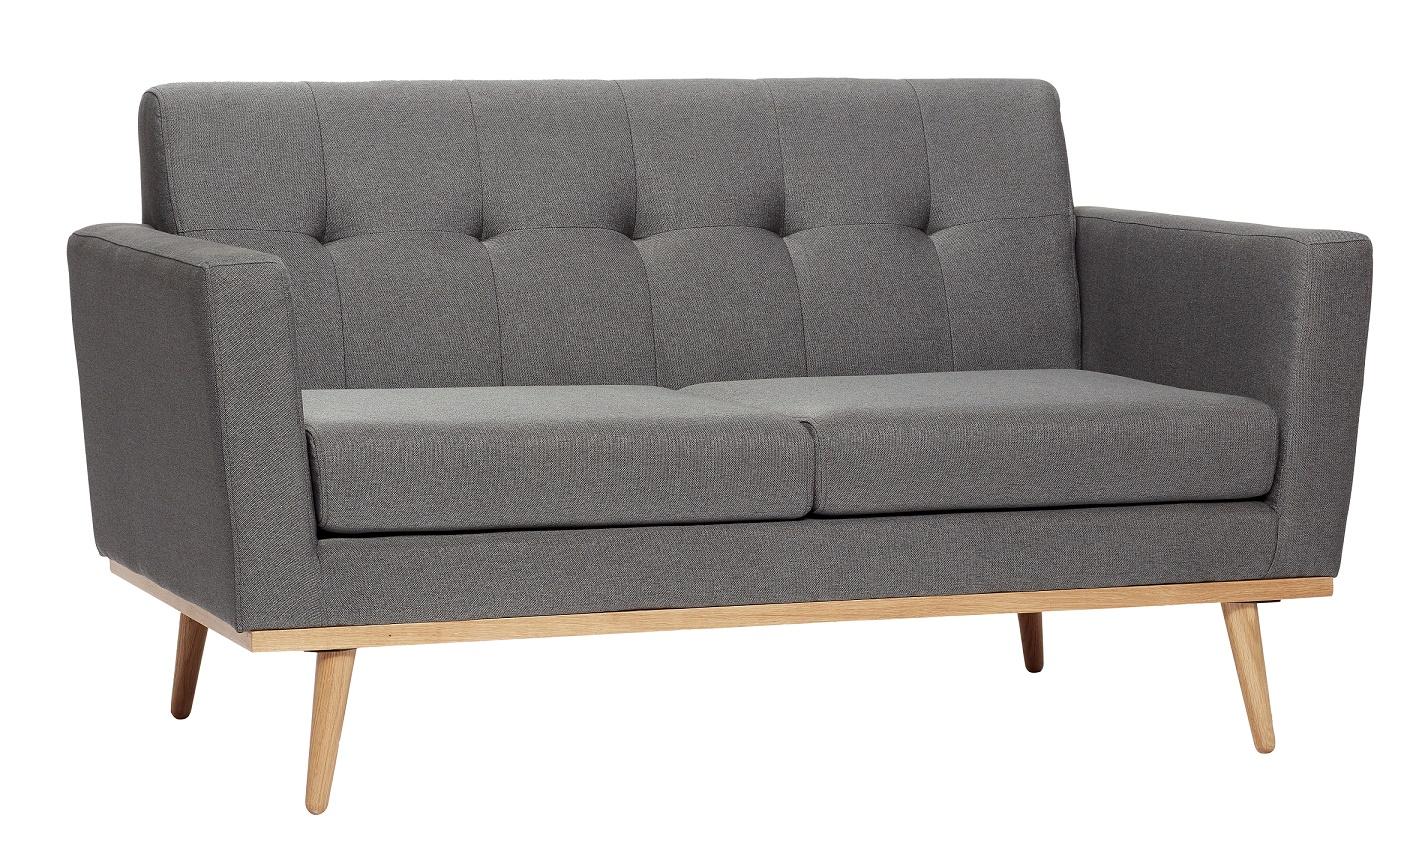 Hübsch classic soffa